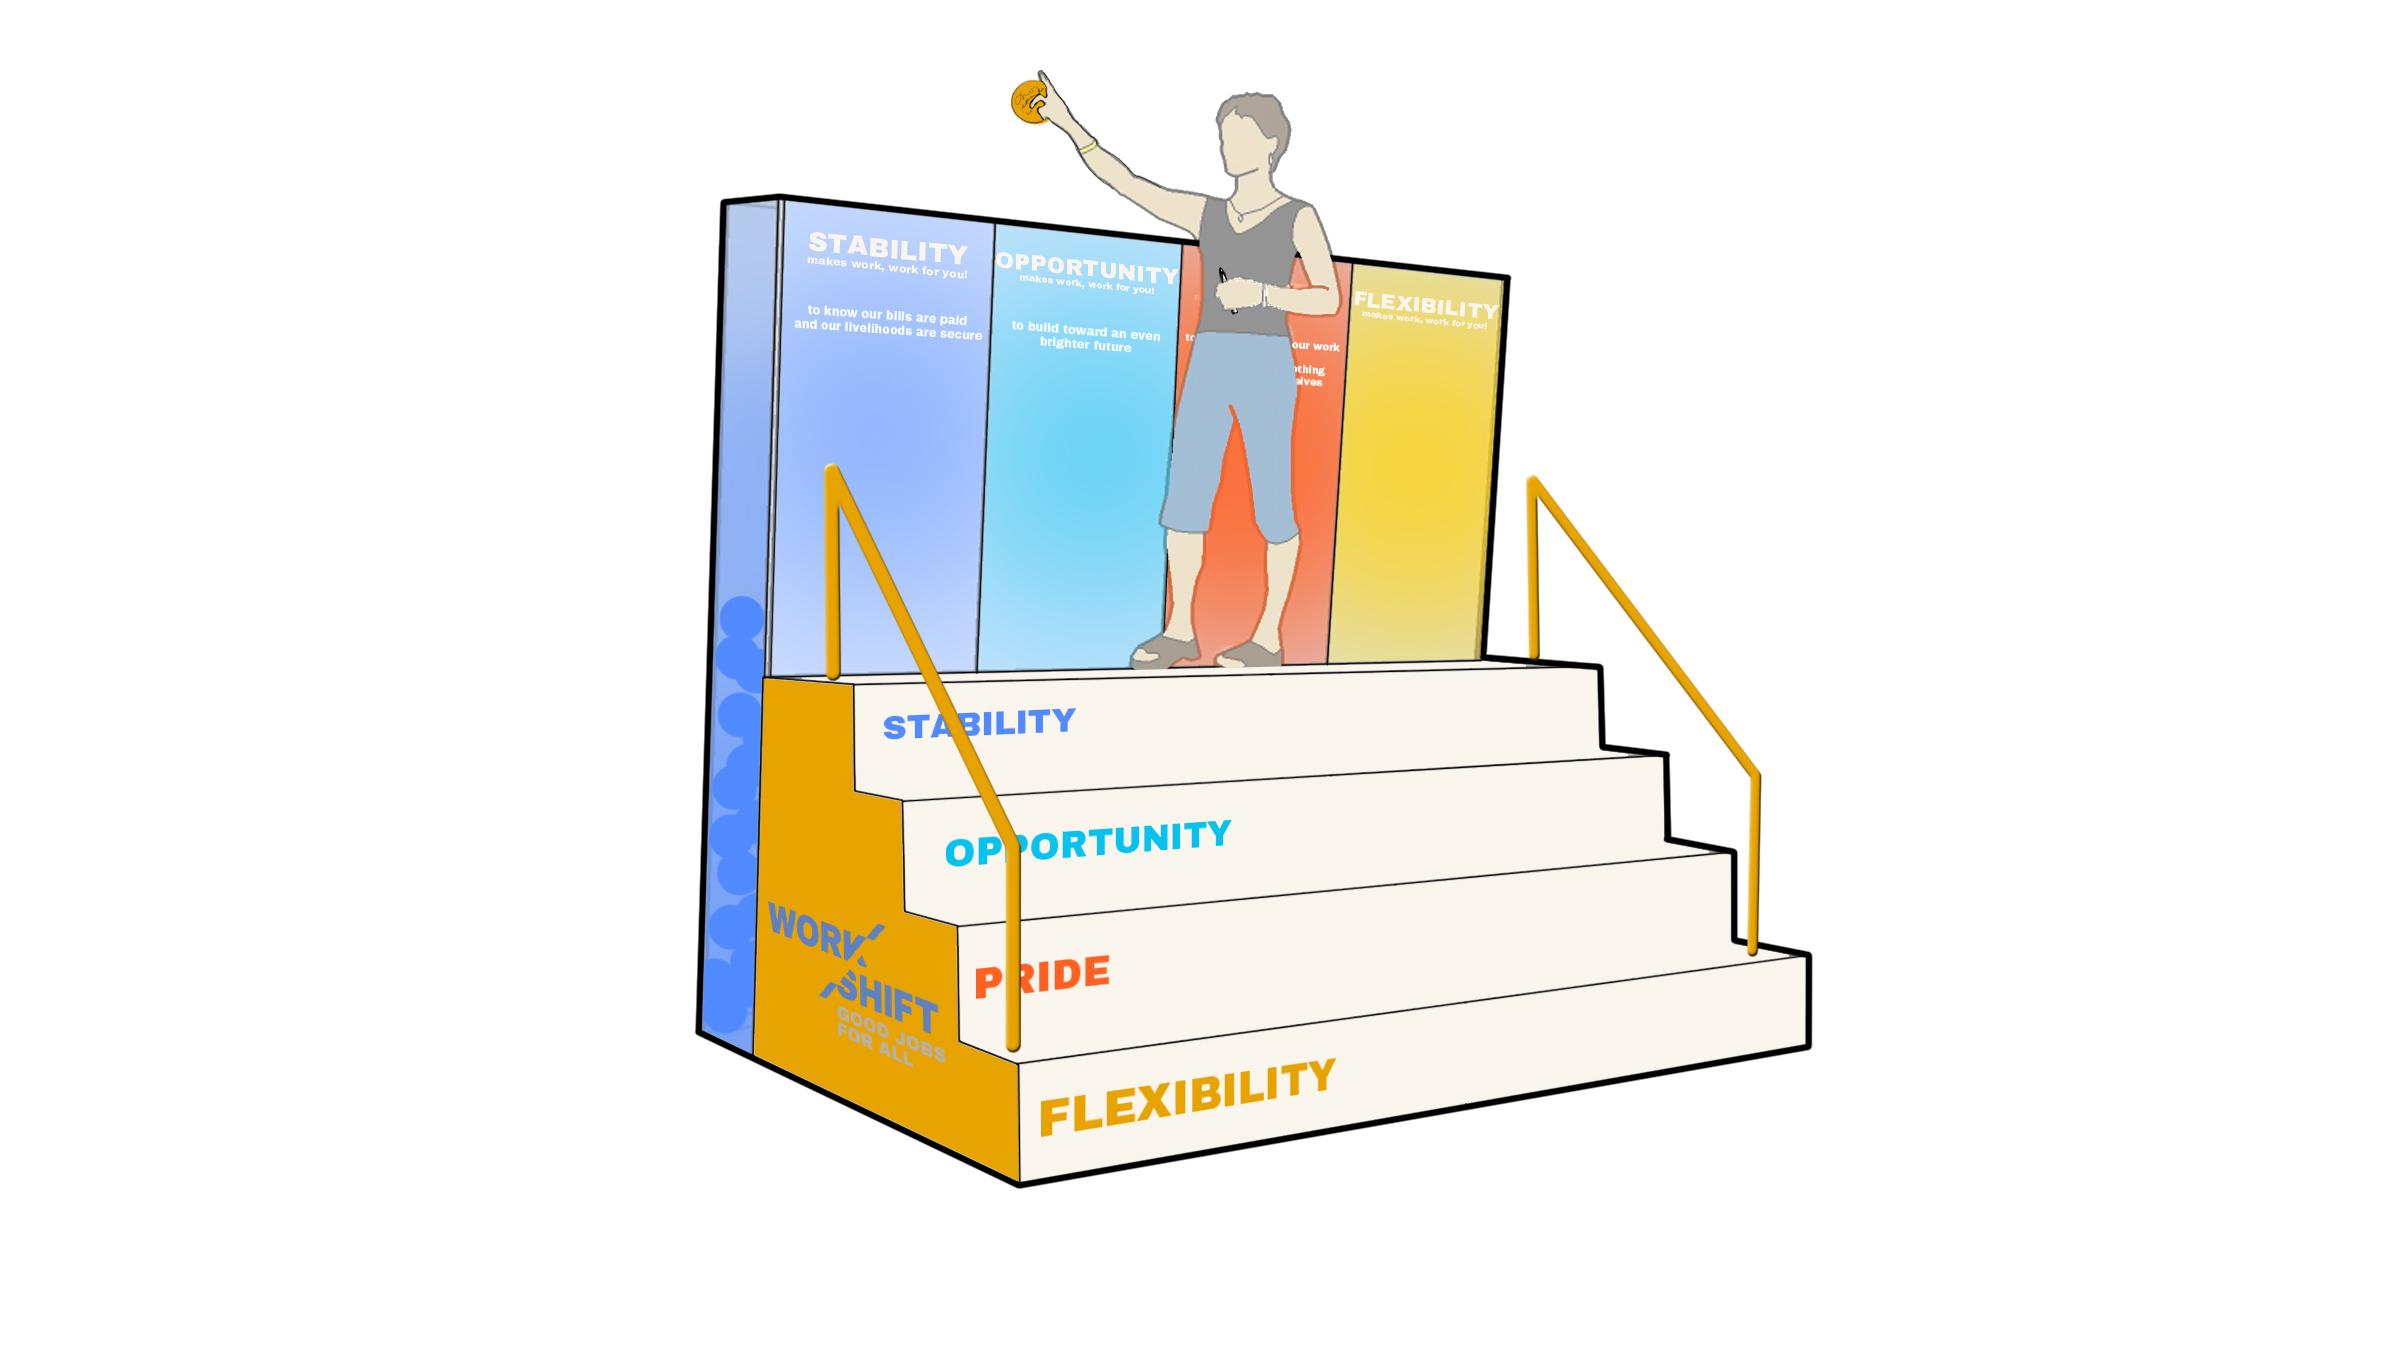 GJFA_Concept3_Illustration_Back_V3_handrails.jpg